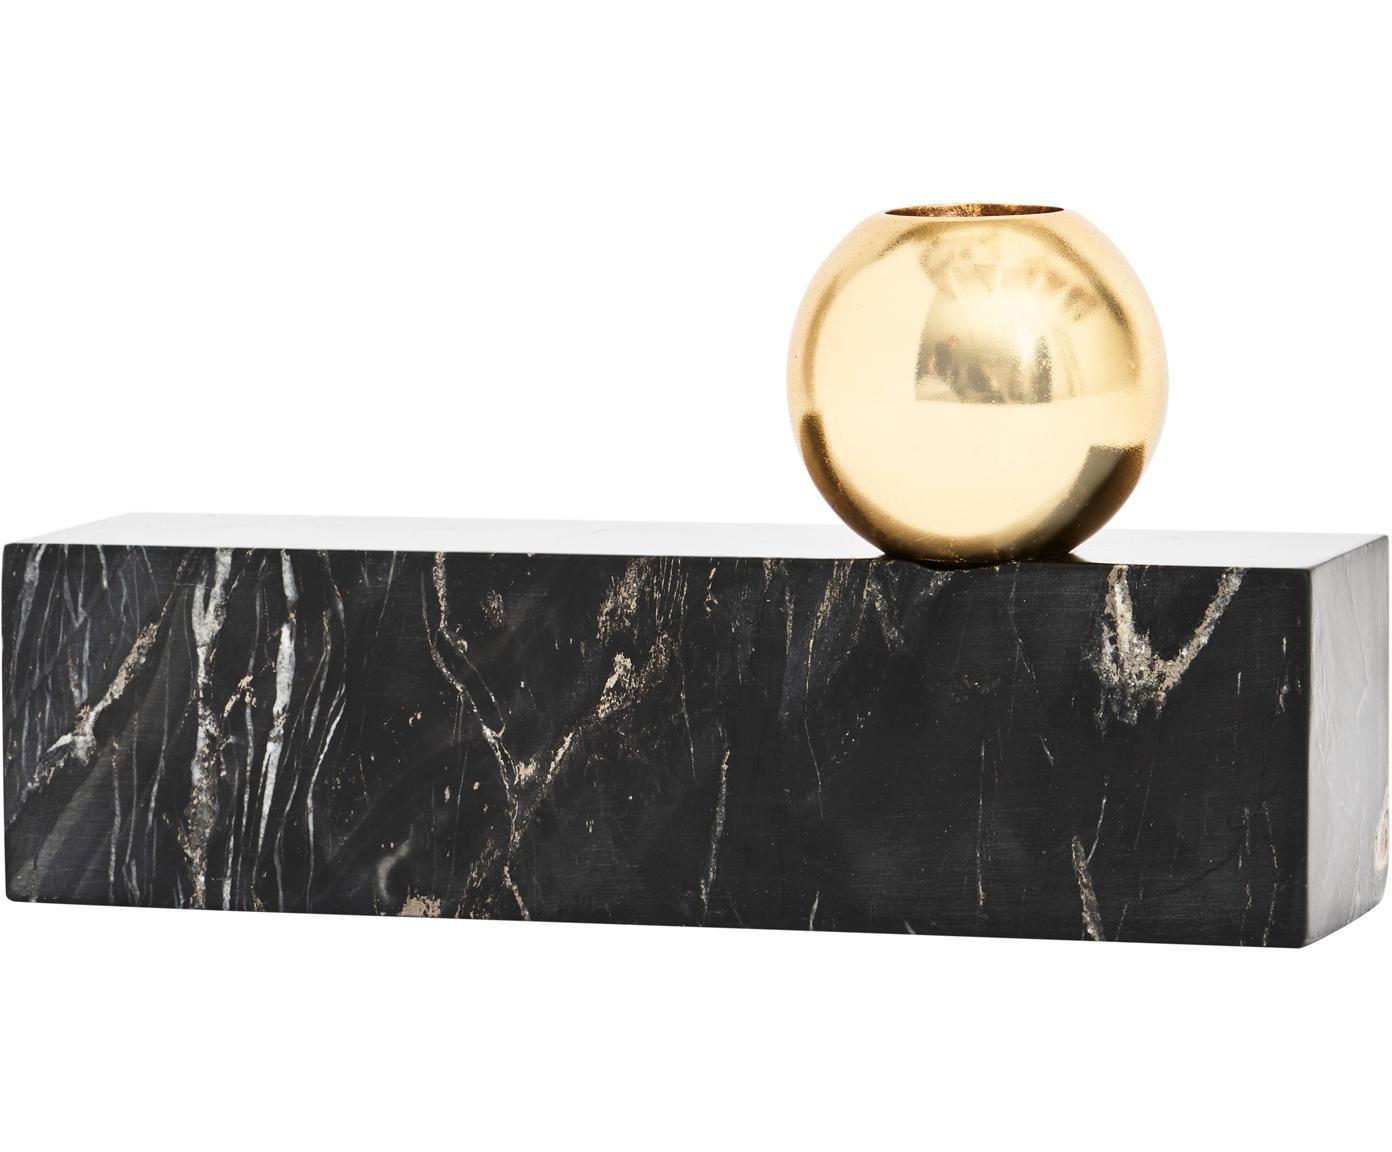 Marmor-Kerzenhalter Tangent, Marmor, Metall, vermessingt, Schwarz, marmoriert, Messing, 17 x 9 cm